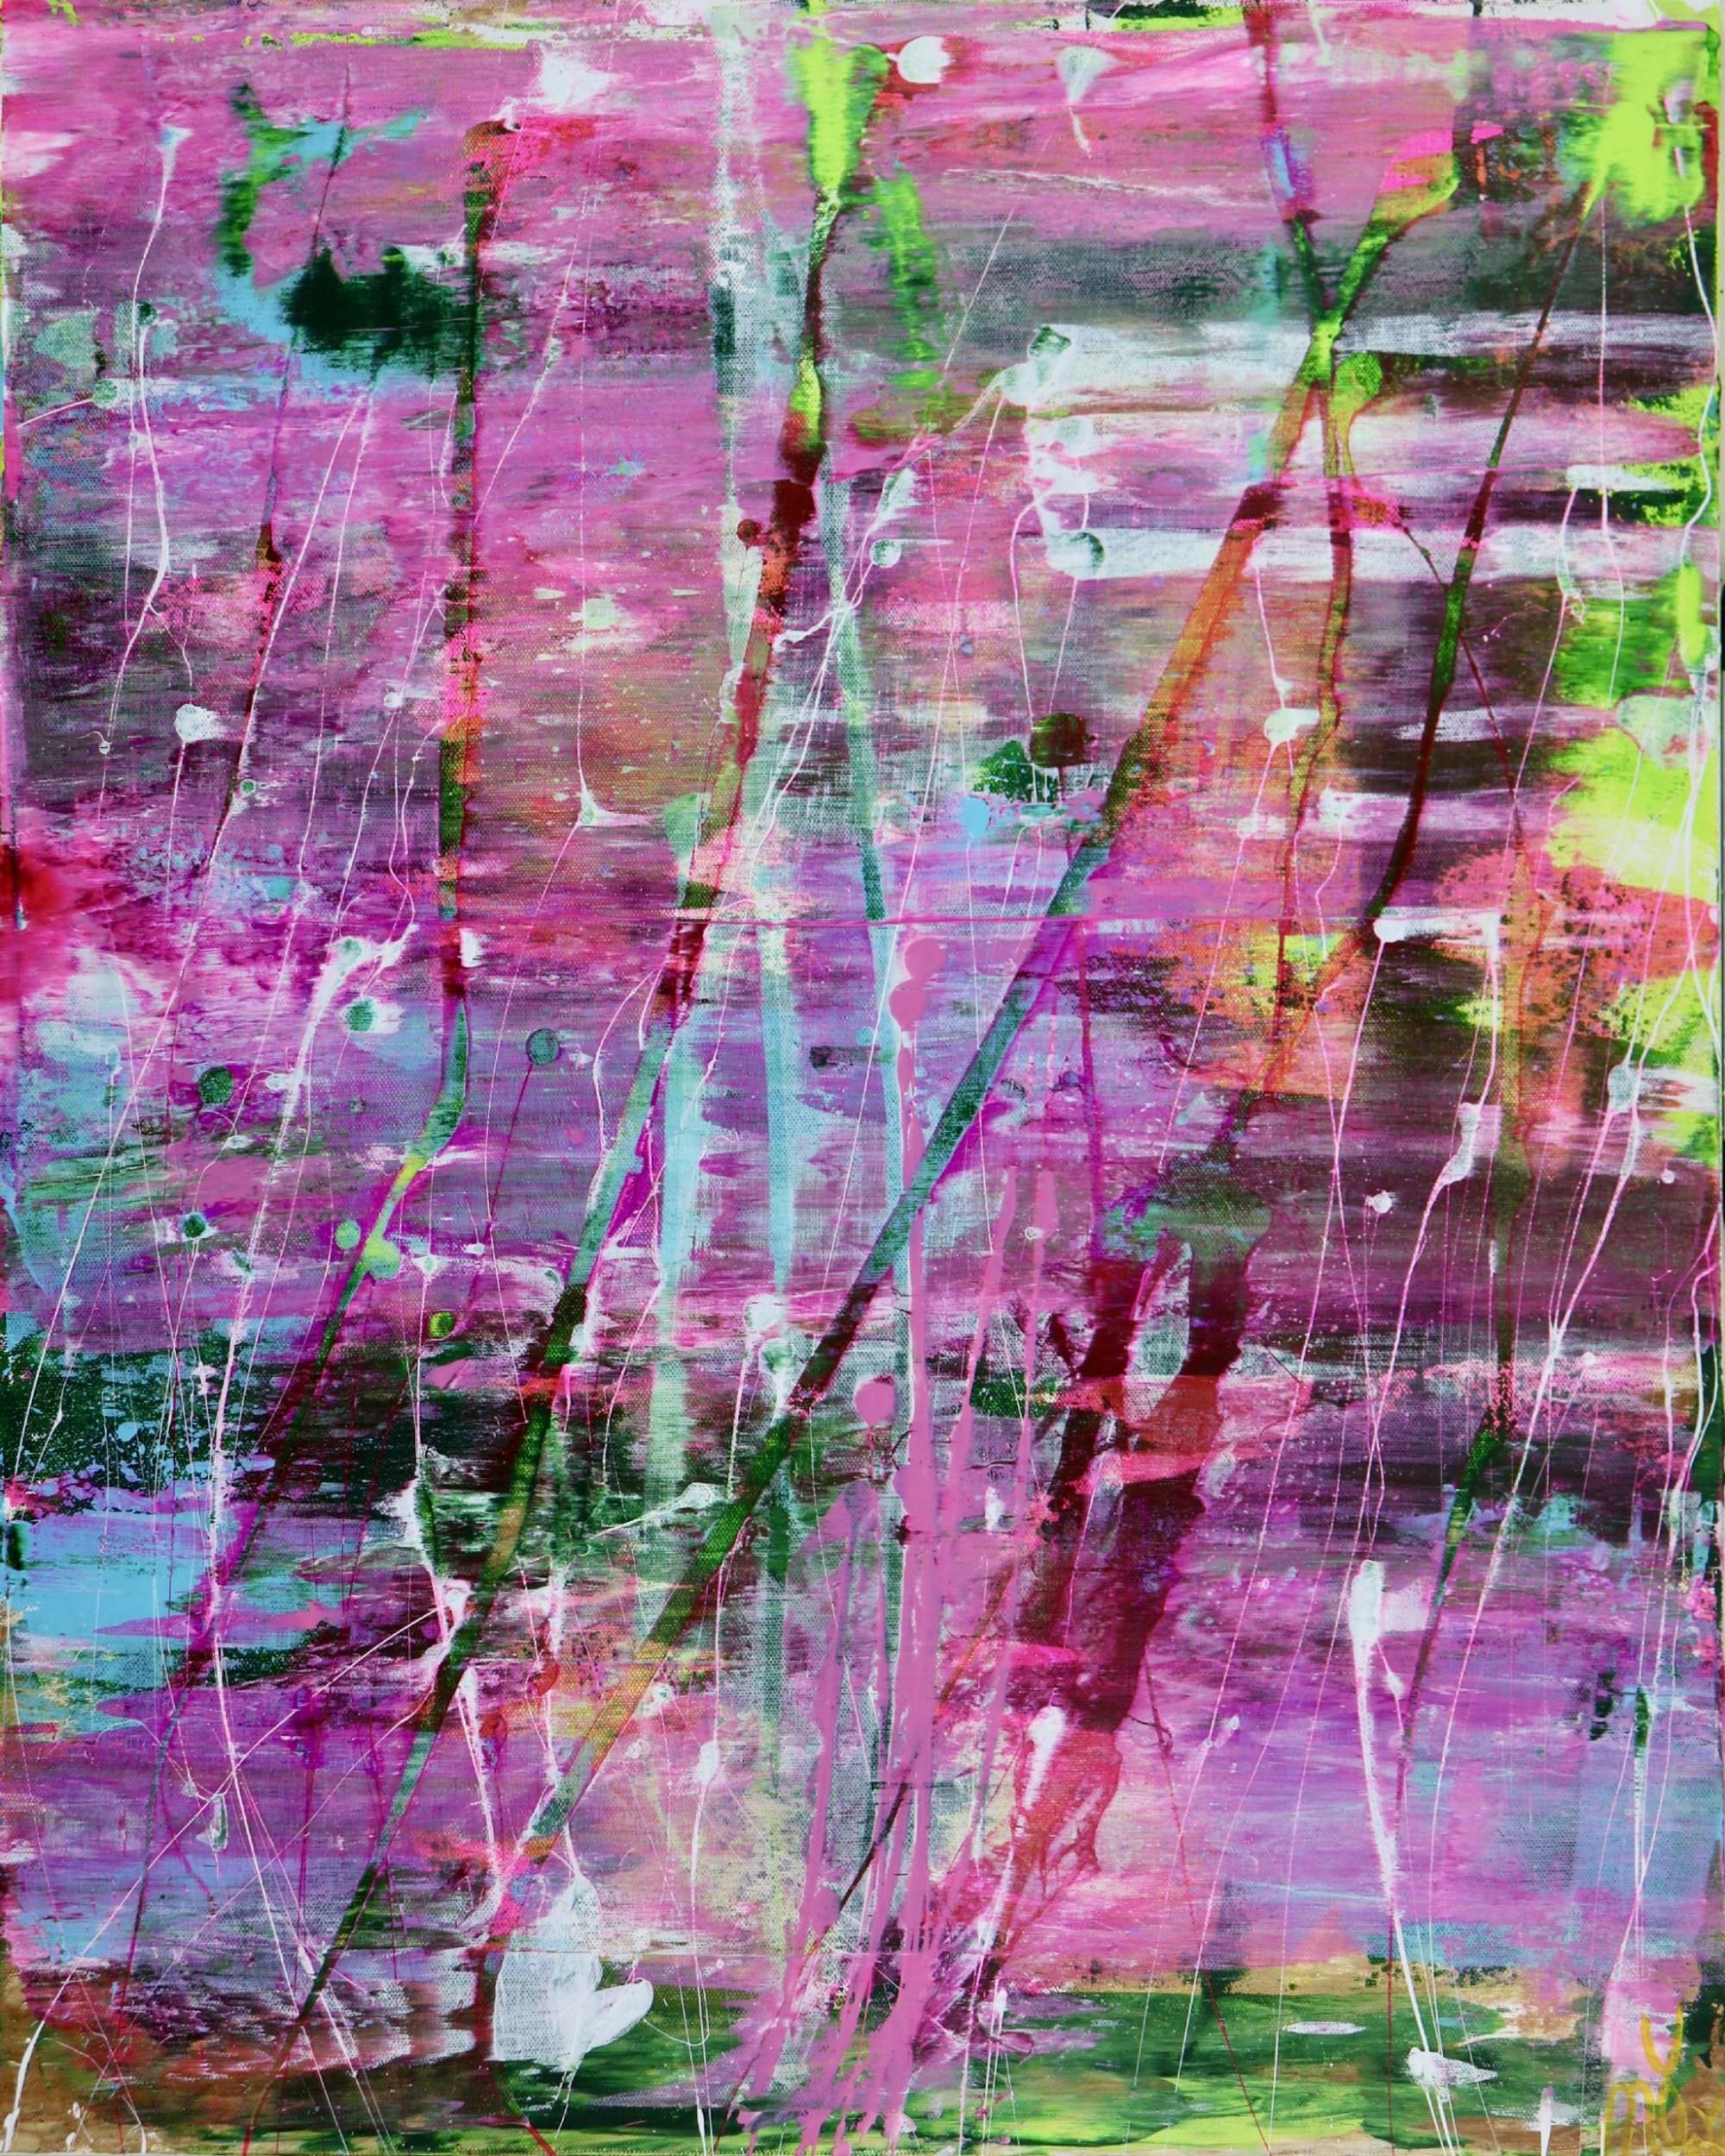 A Closer Look (Avant Garden) 1 (2020) by Nestor Toro